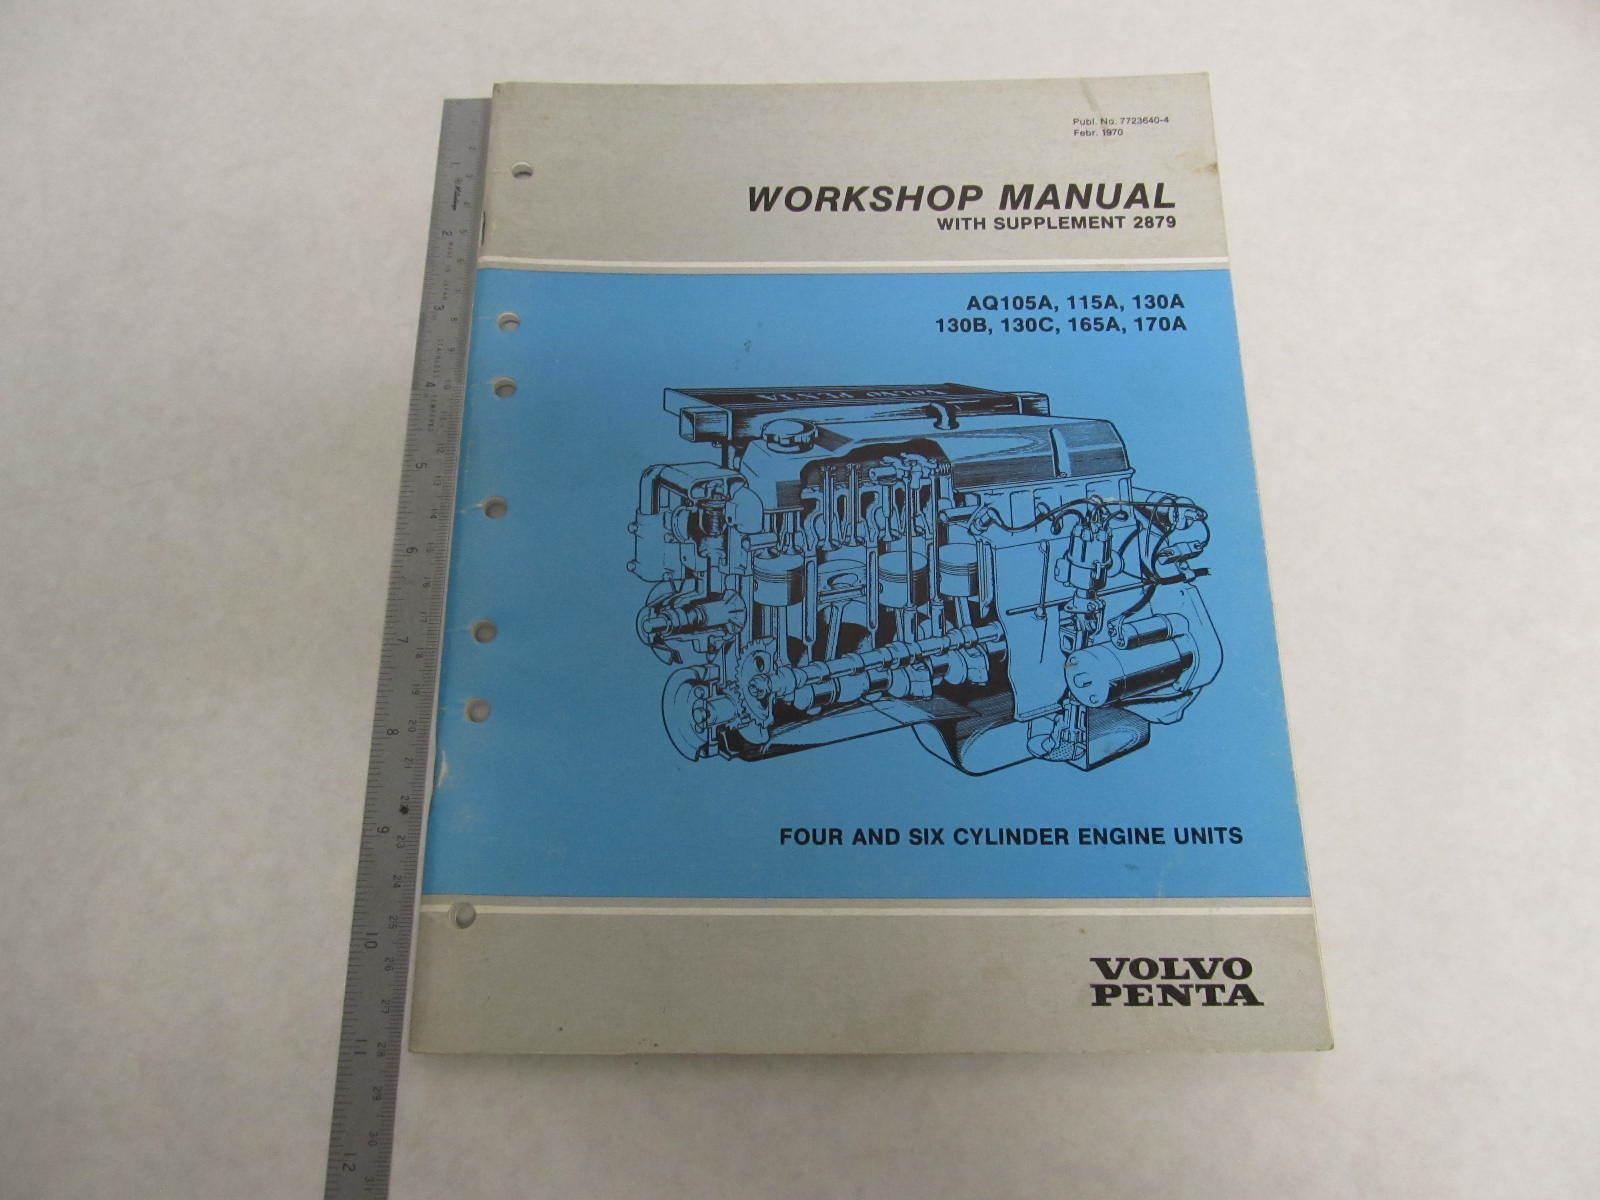 7723640 4 1970 volvo penta aquamatic service workshop Volvo Penta Outdrive Volvo Penta Parts